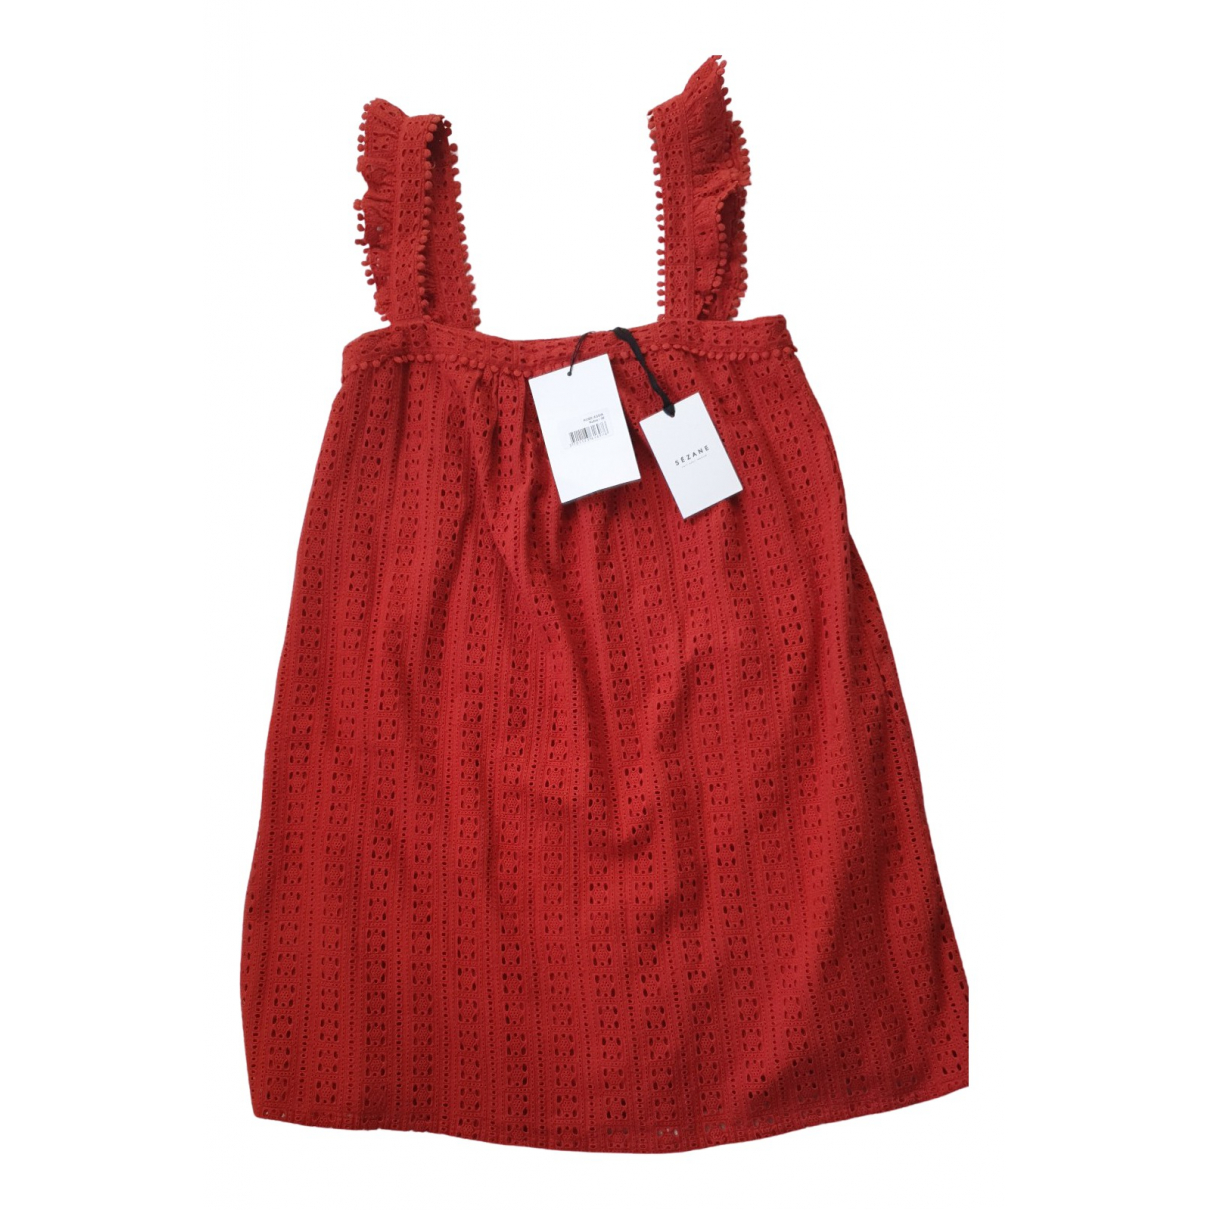 Sezane - Robe Spring Summer 2019 pour femme en coton - rouge